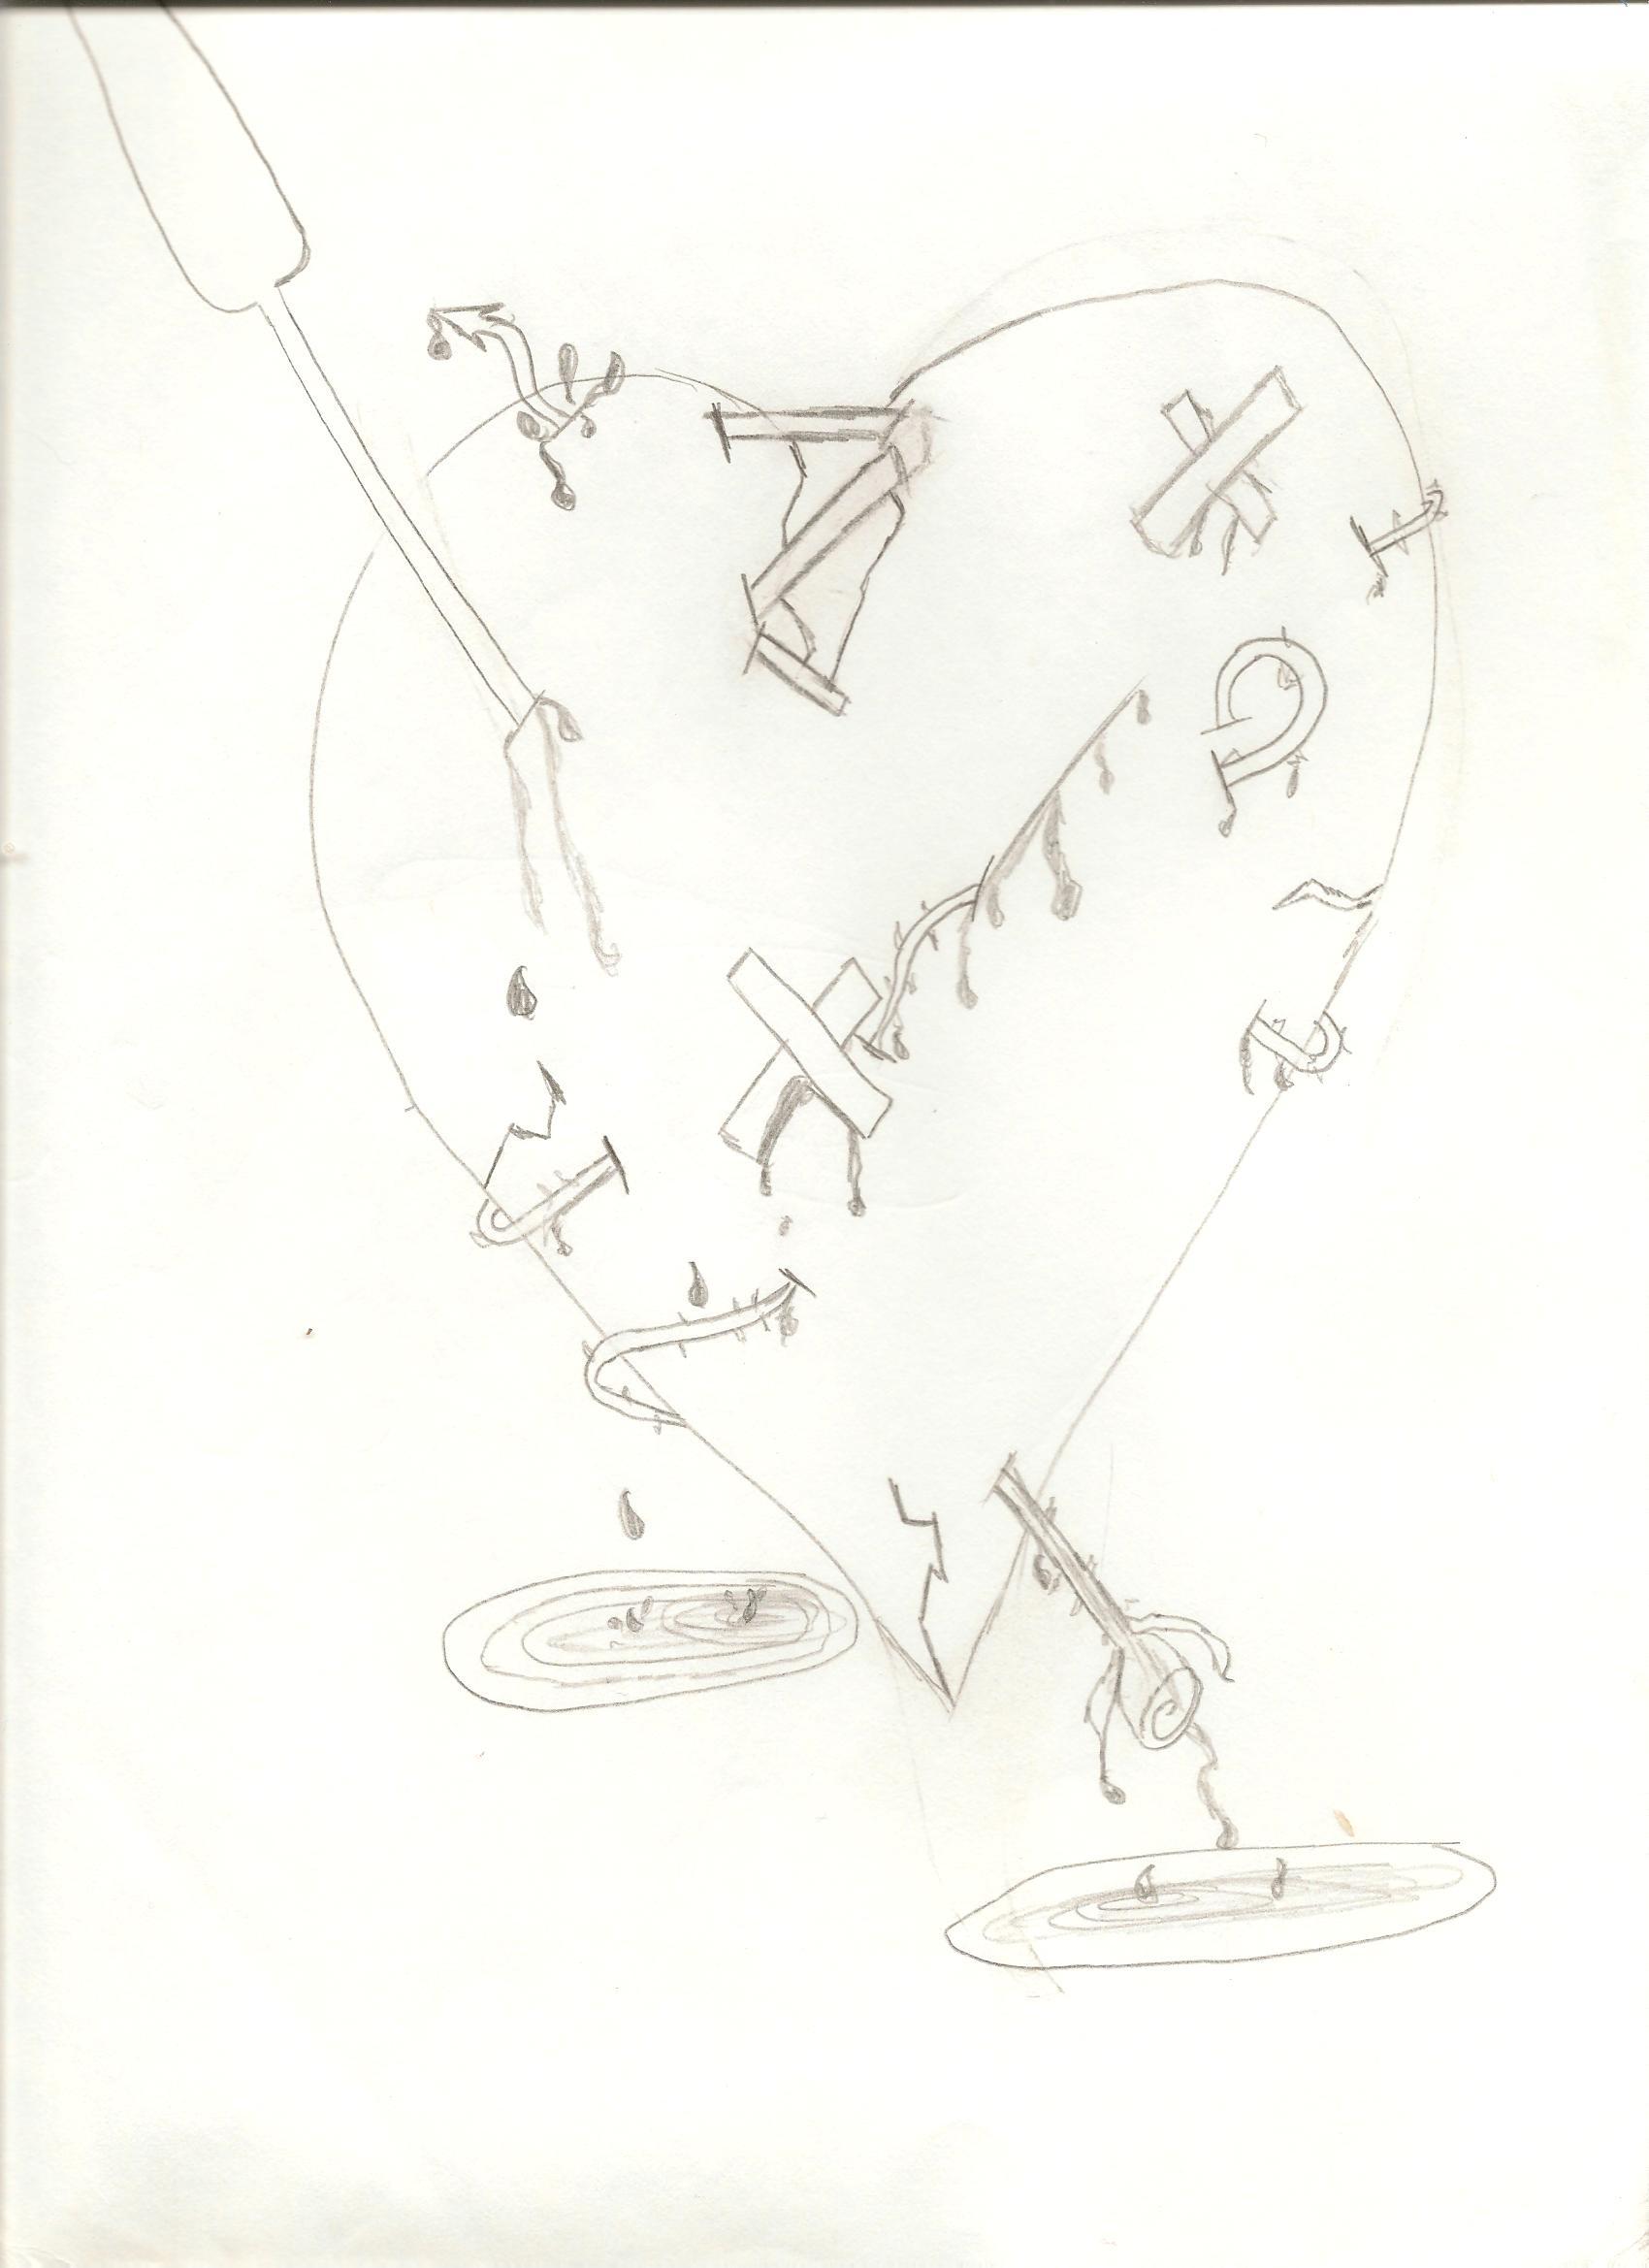 Mutilated Heart